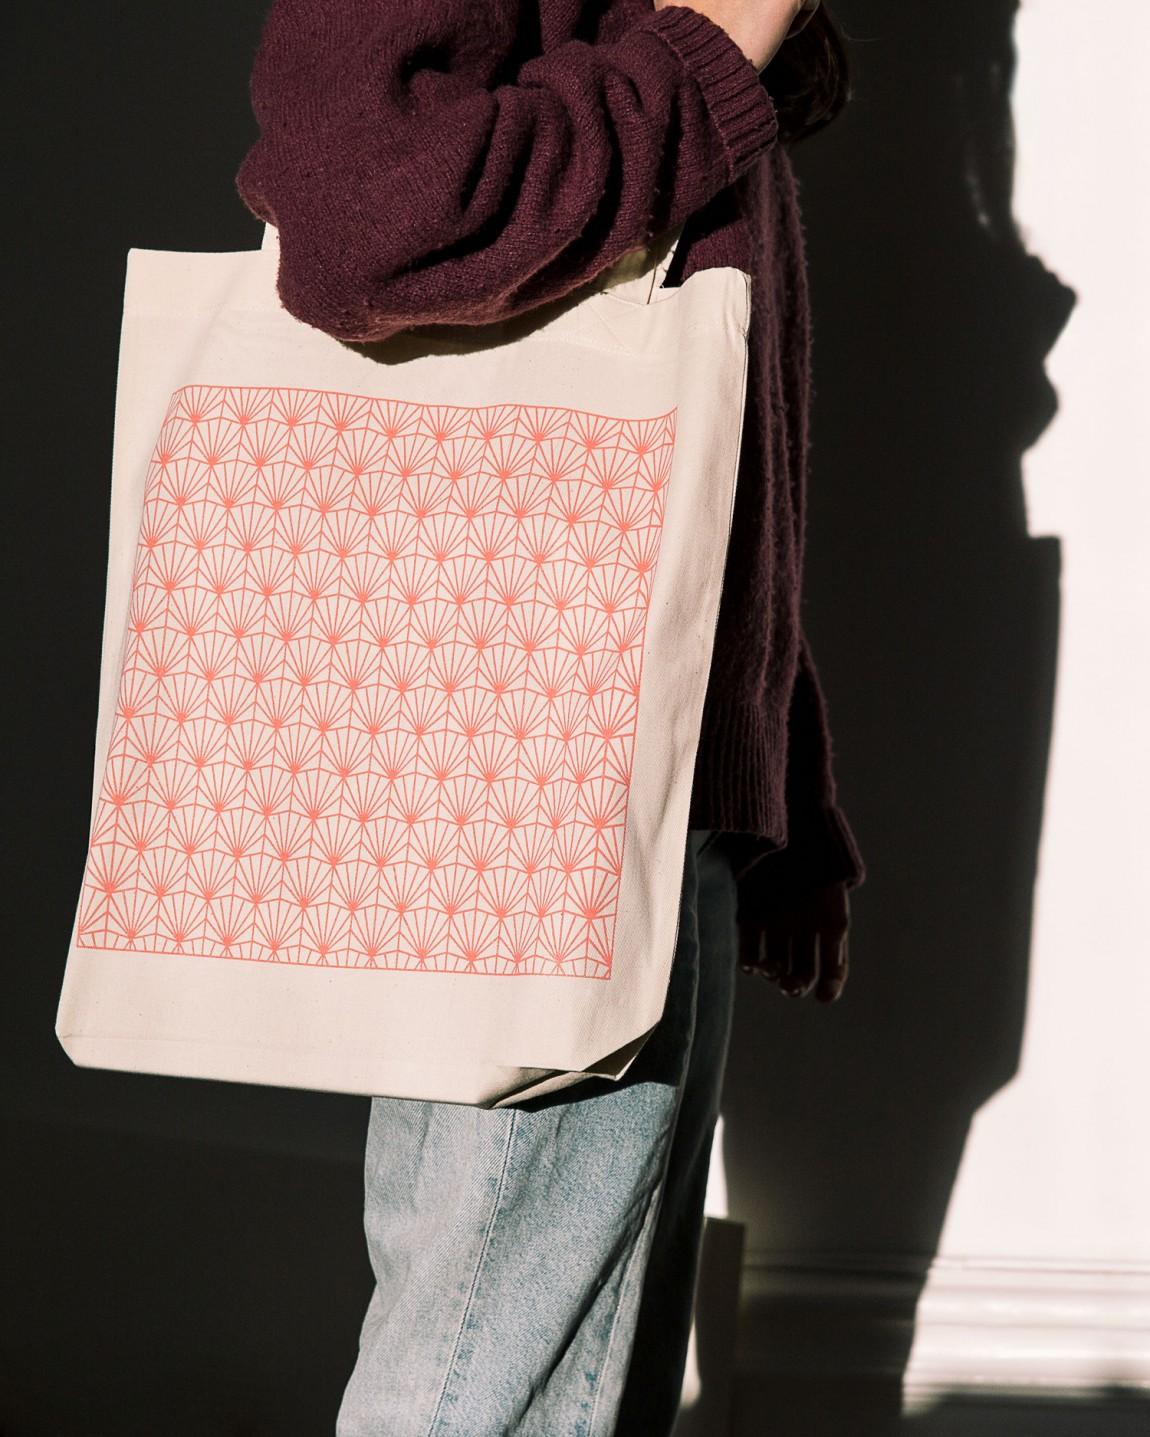 Fab Media瑞典媒体公司品牌升级改造,手提袋设计